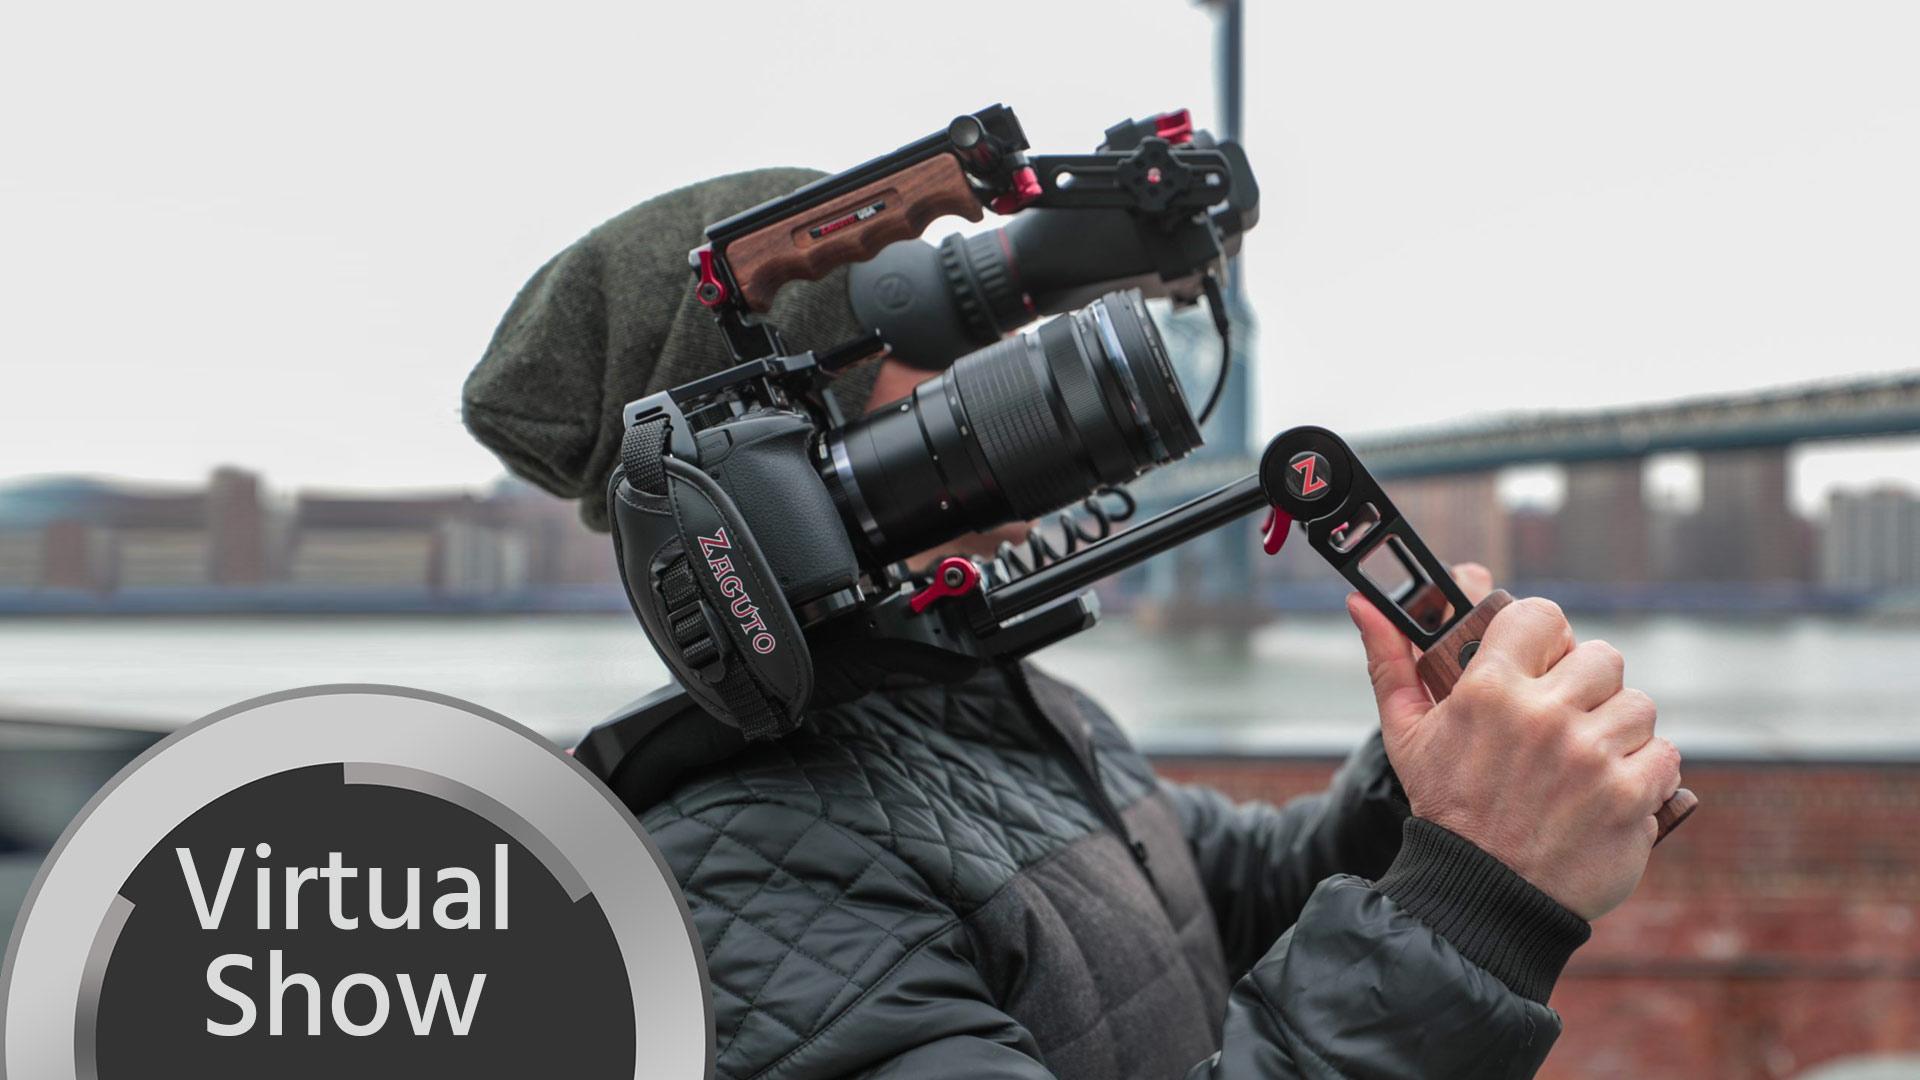 ZacutoがACT Recoil Rigを発売 - DSLR/ミラーレスカメラ用リグ